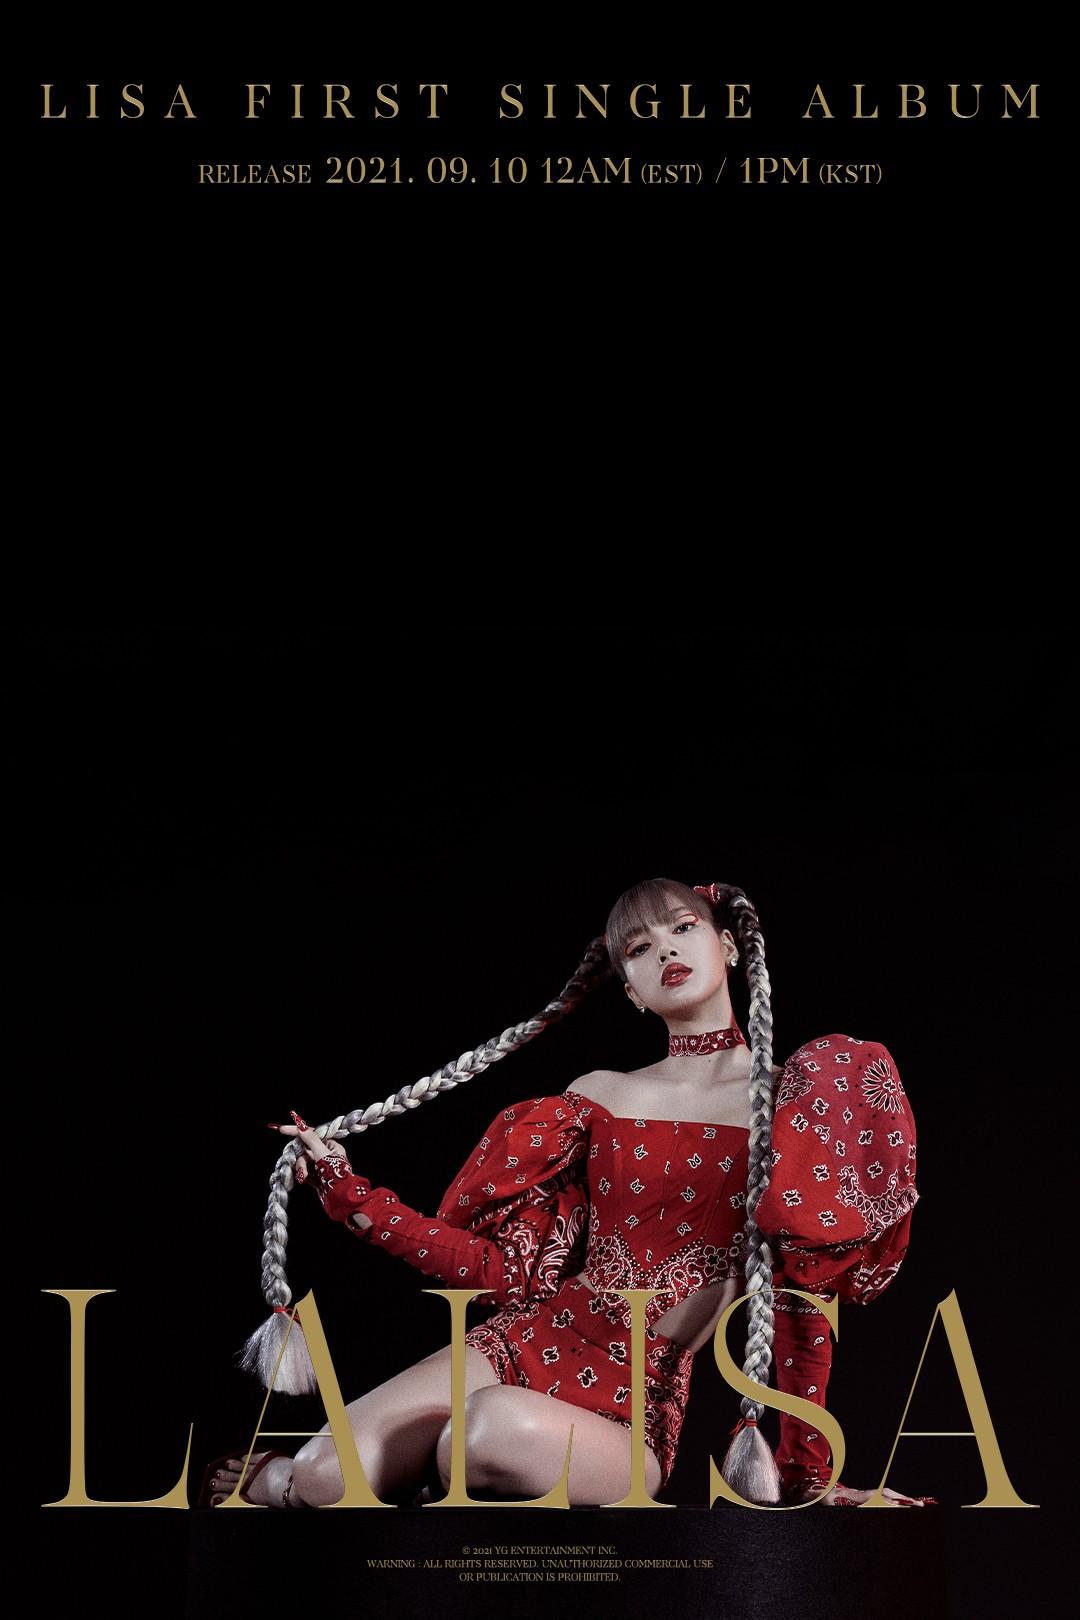 Lisa (Foto: YG Entertainment)